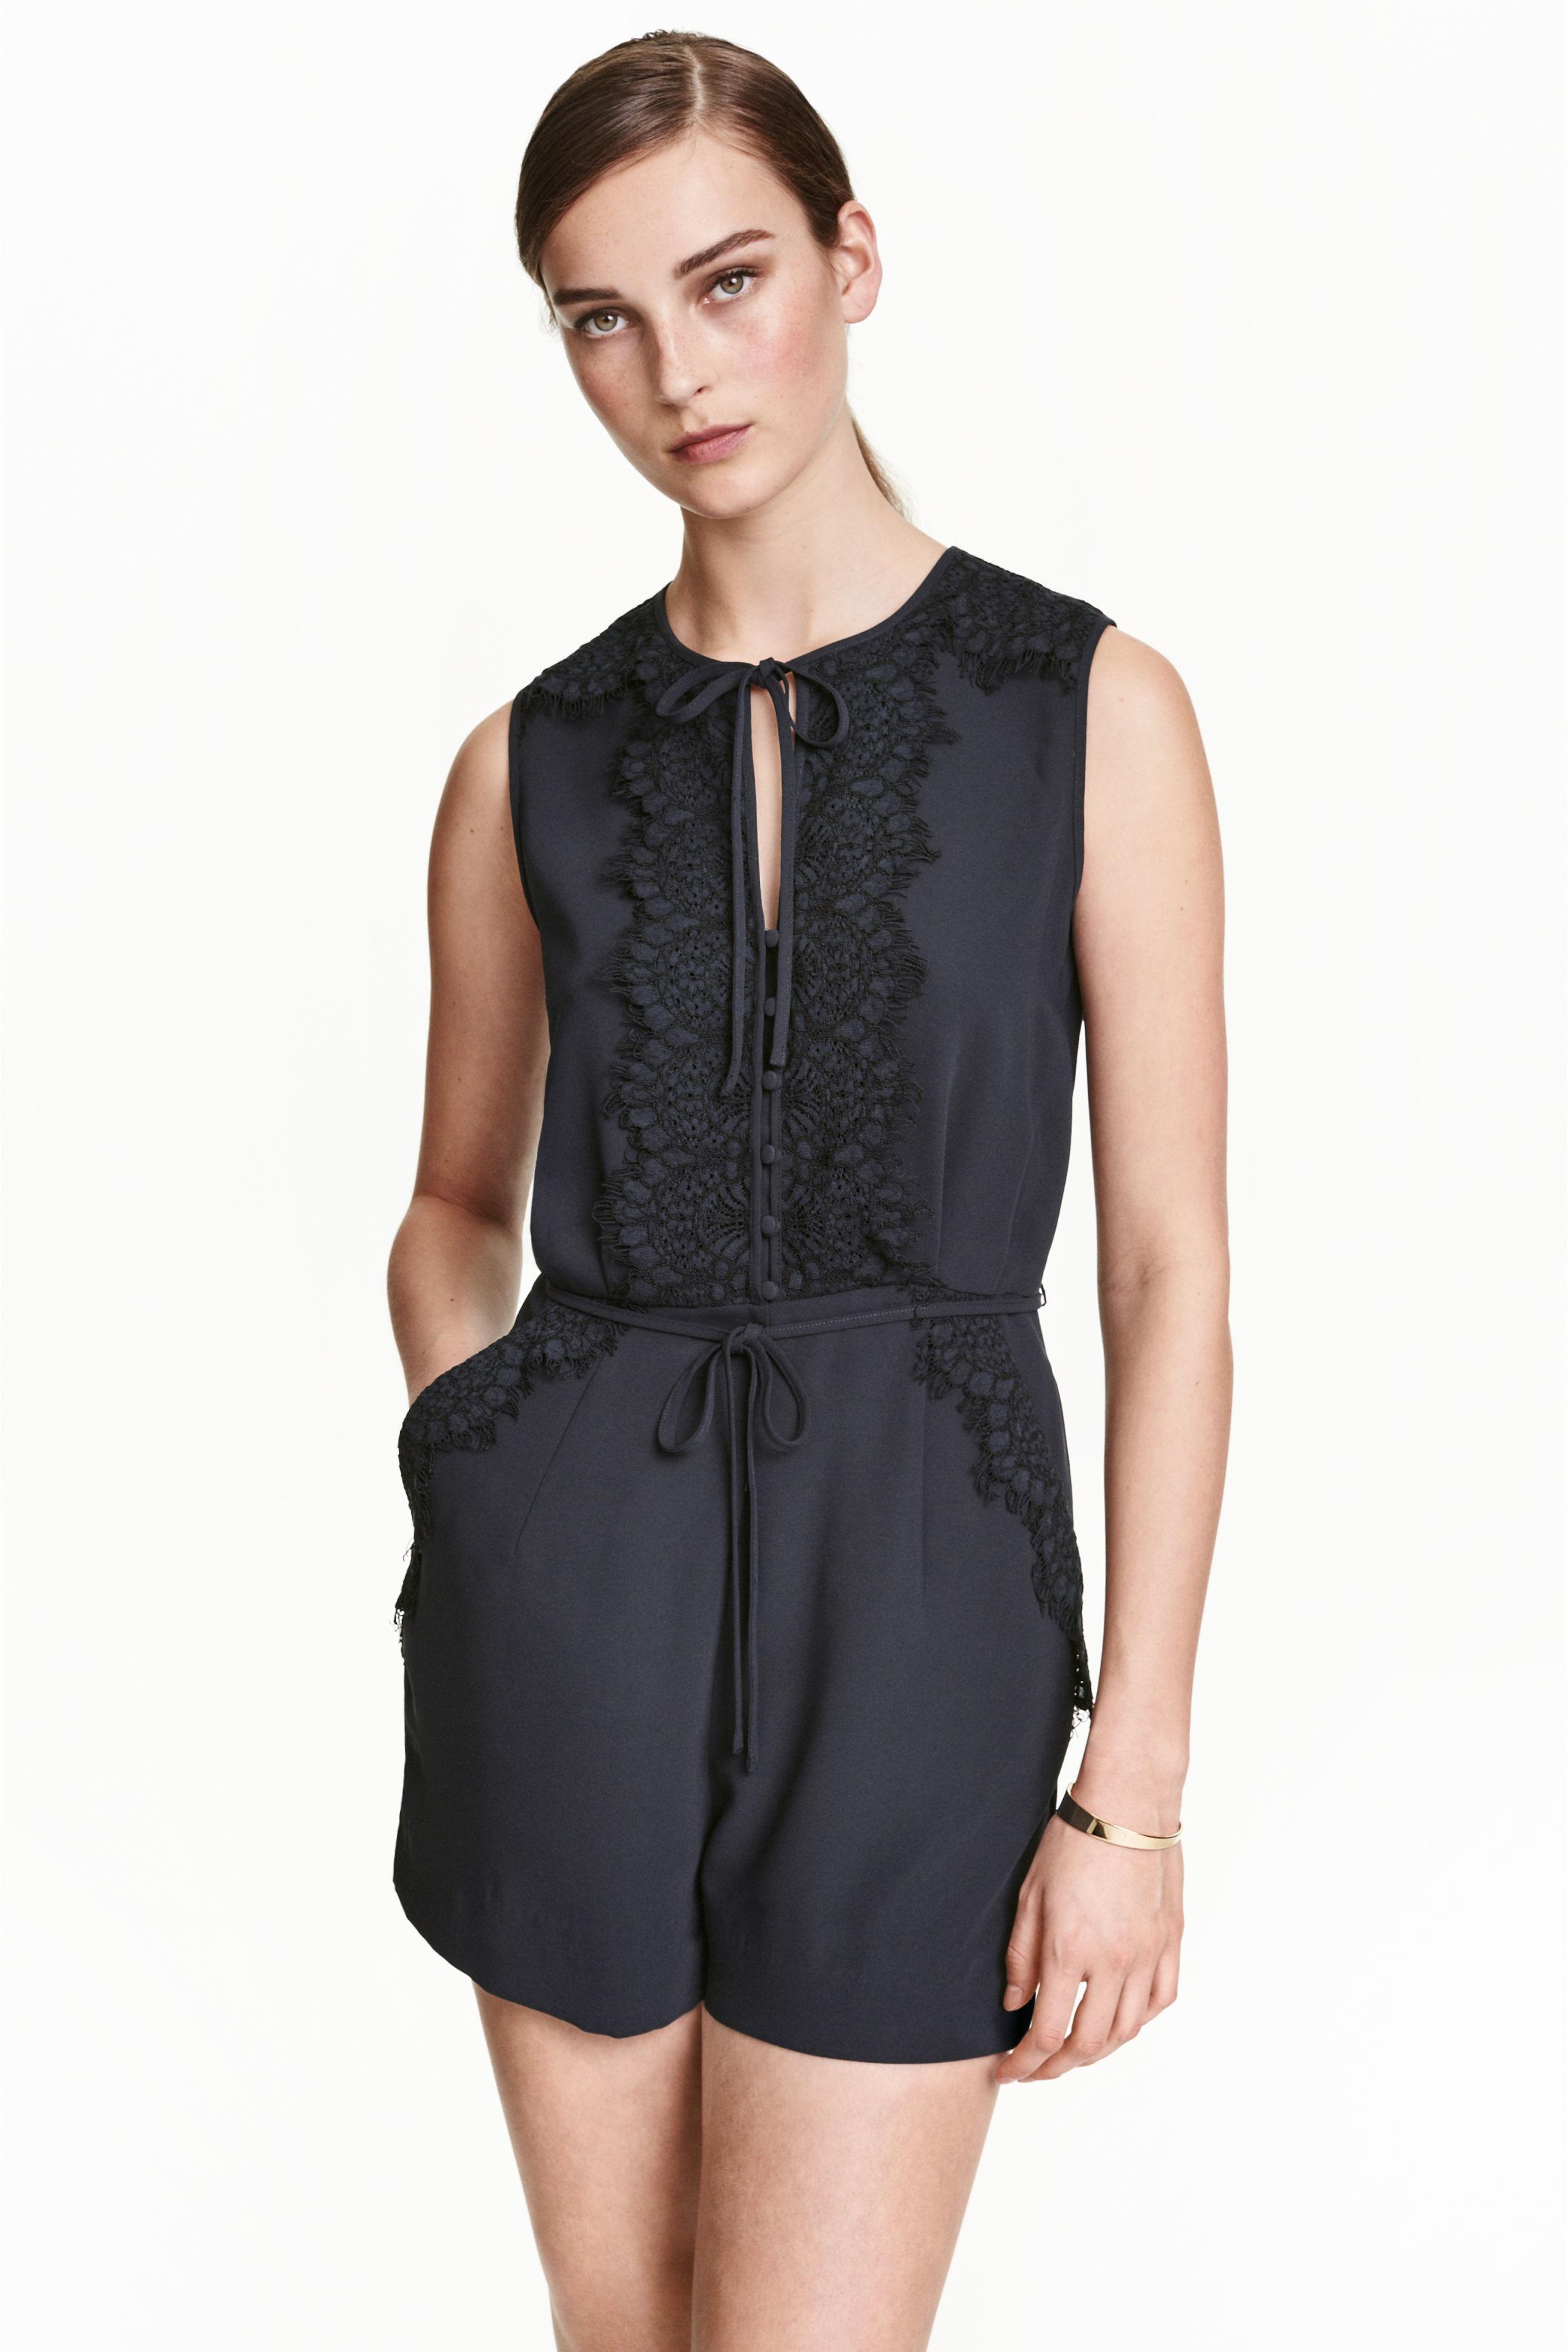 nine.99 plus size dresses